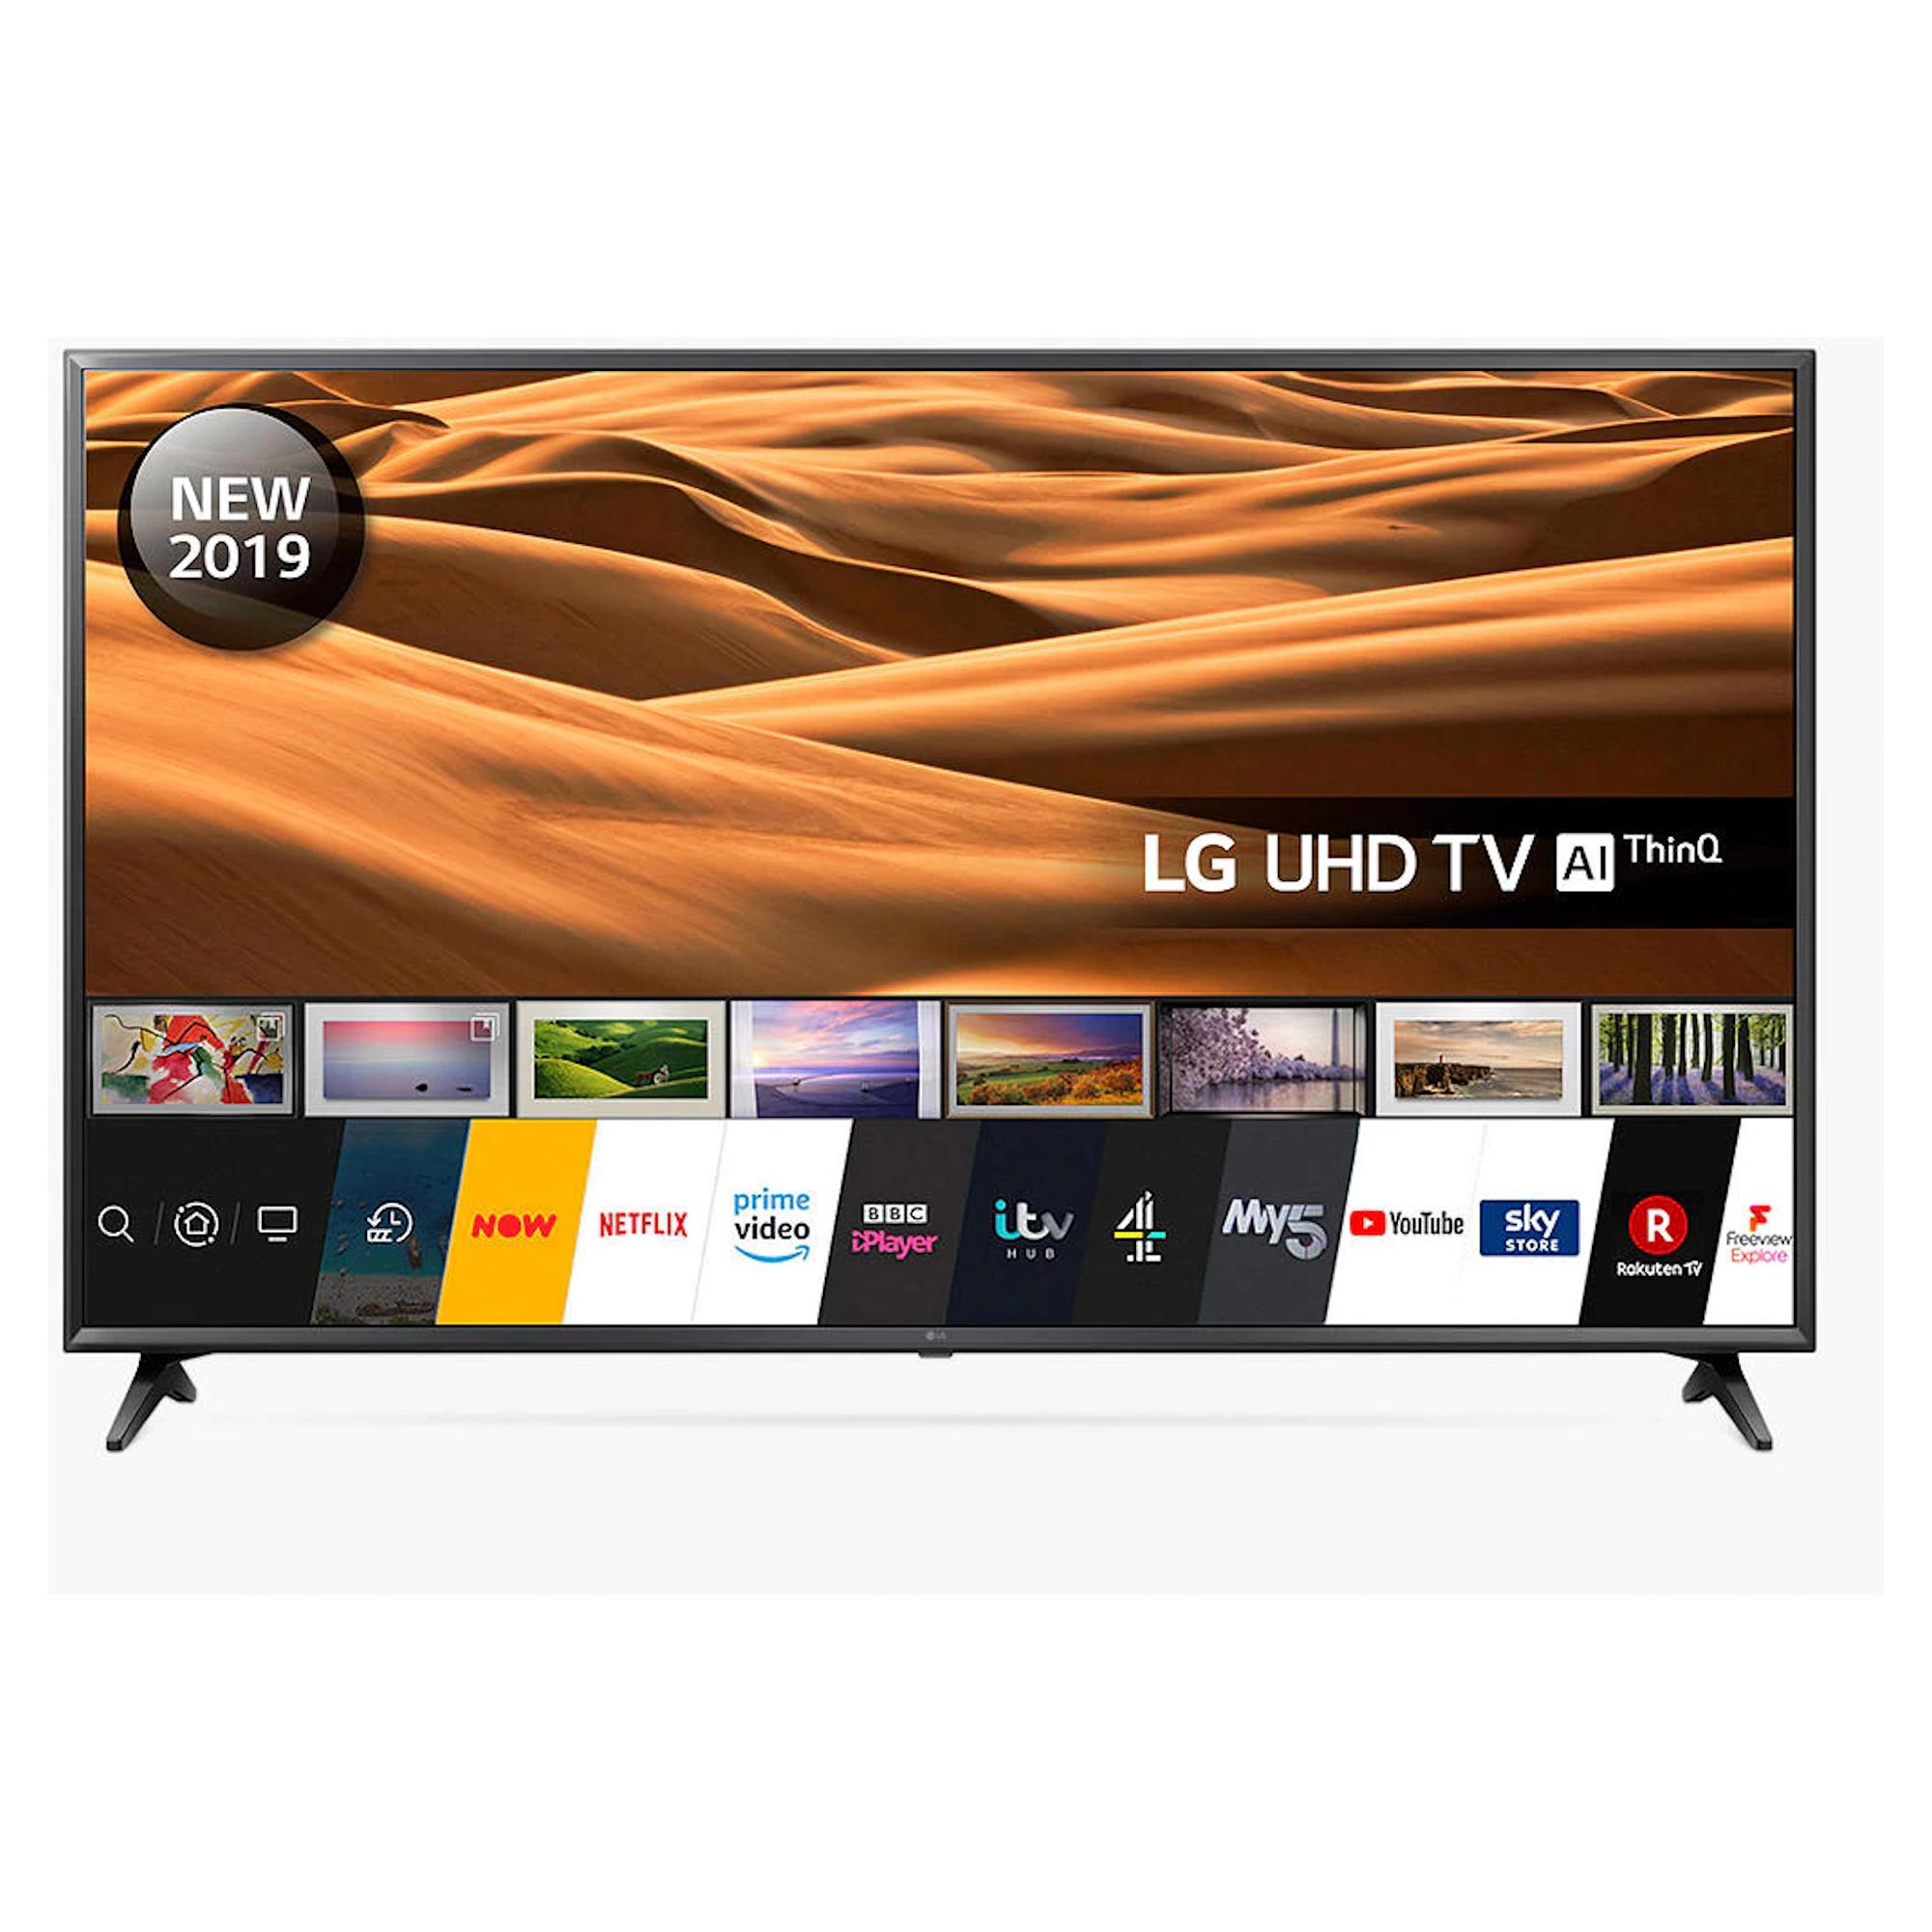 "LG 65UM7000PLA 65"" Smart 4K Ultra HD HDR LED TV (2019 Model) - £539 at Hughes eBay with code"